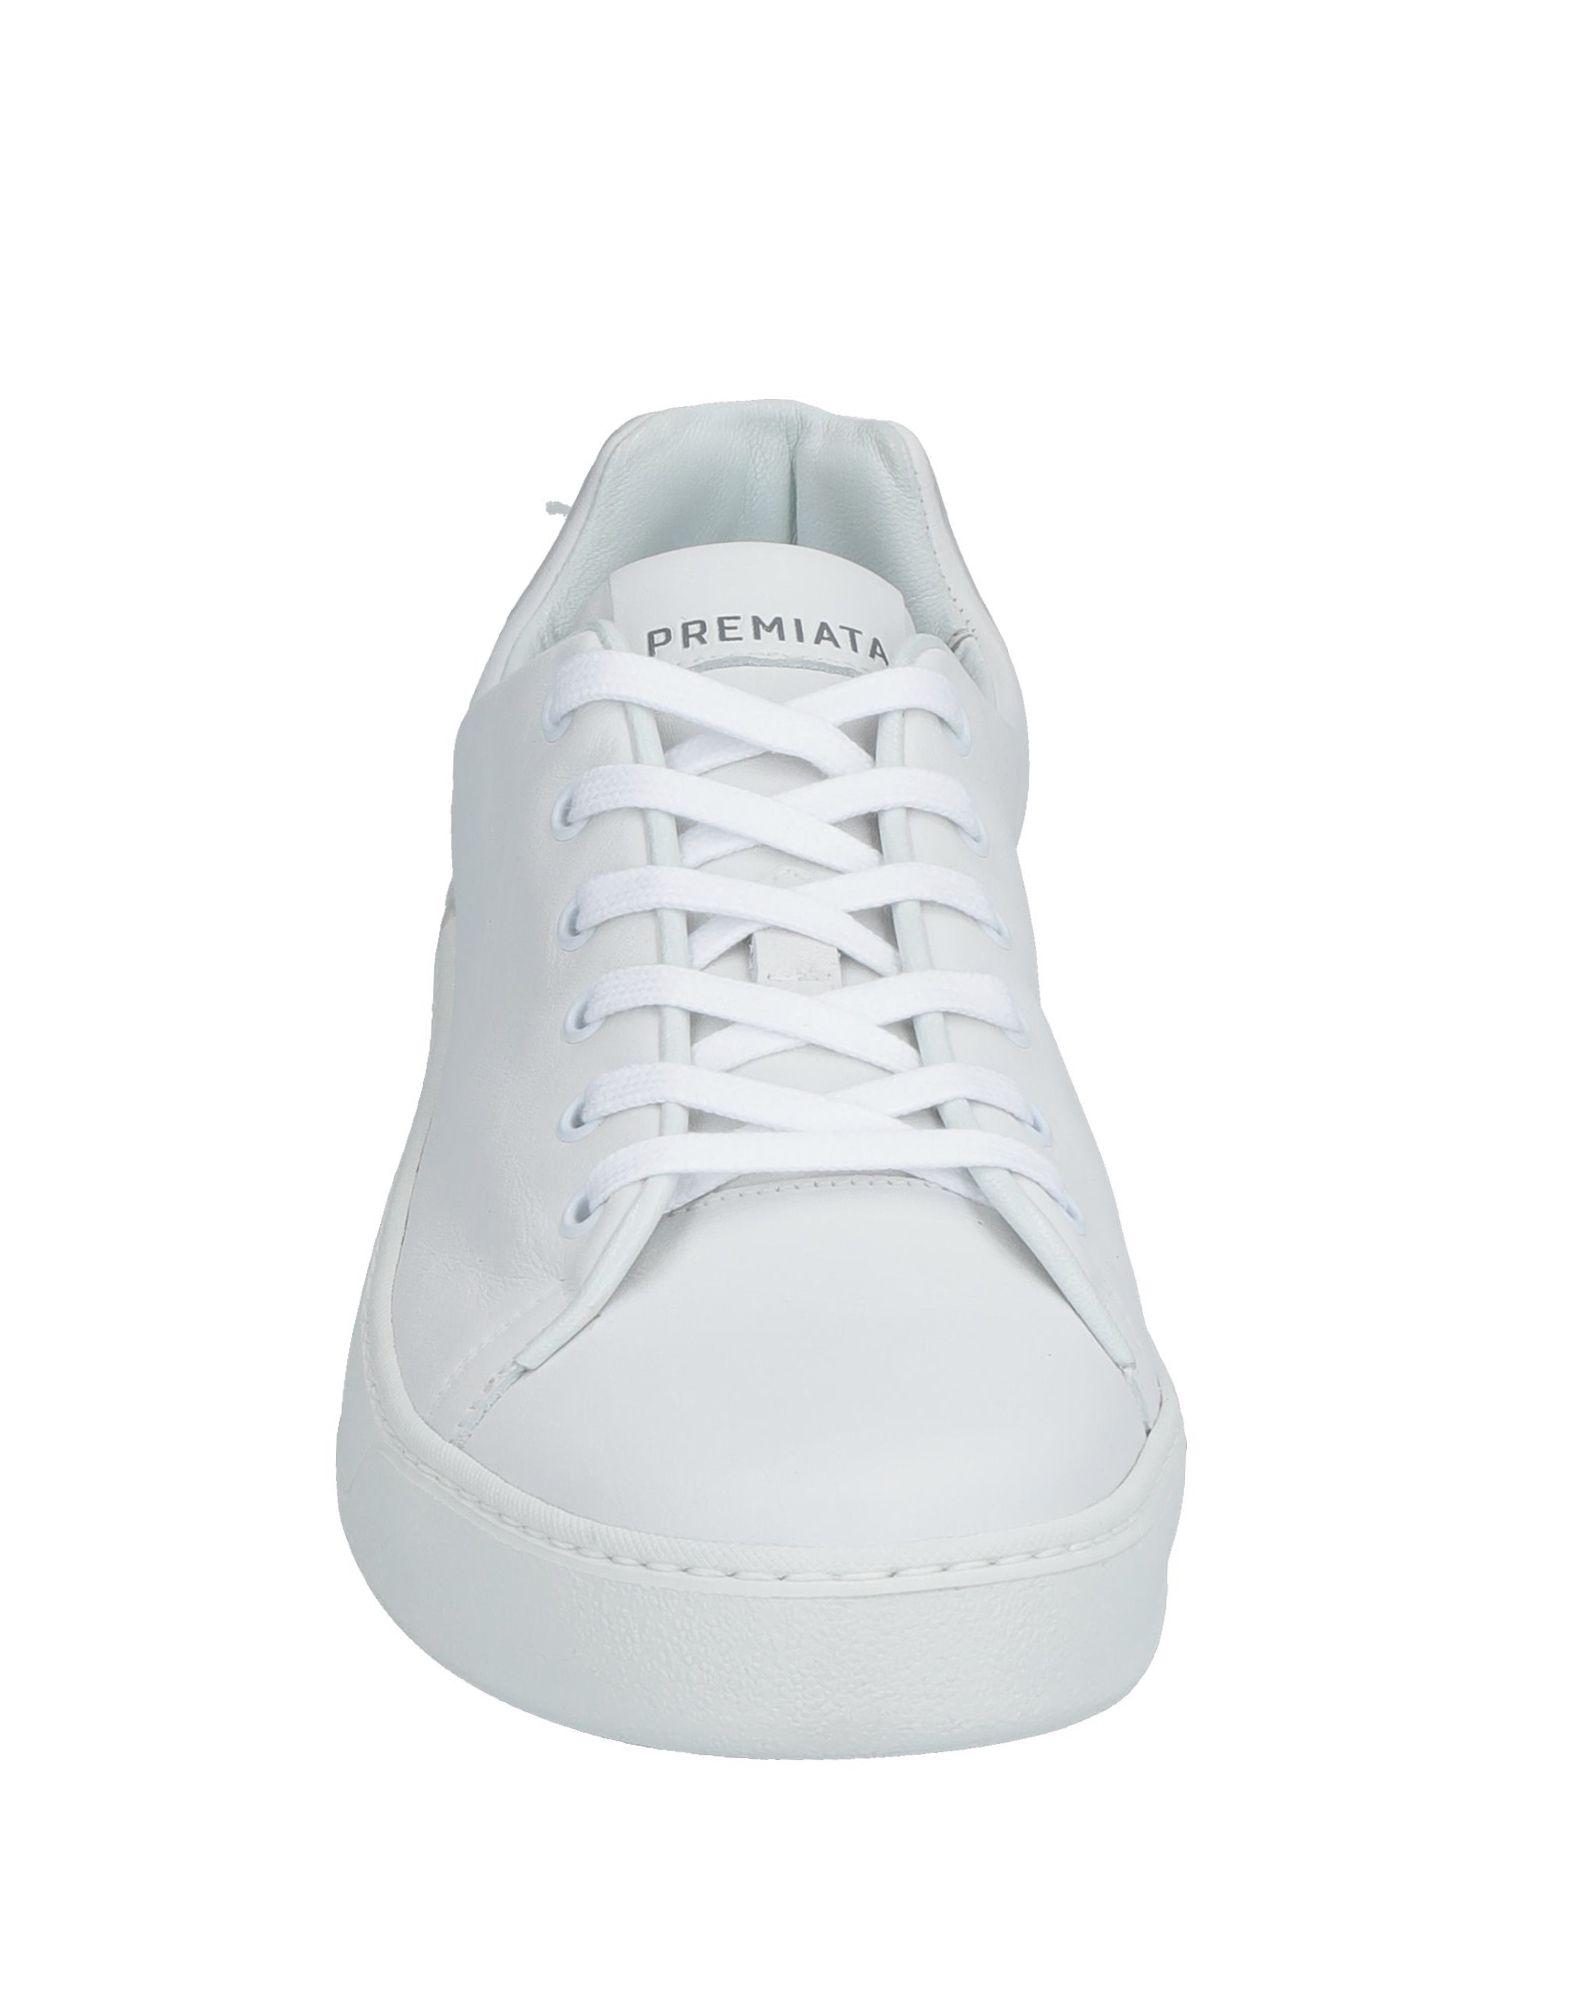 Premiata 11535878UP Sneakers Herren  11535878UP Premiata Gute Qualität beliebte Schuhe a5b251